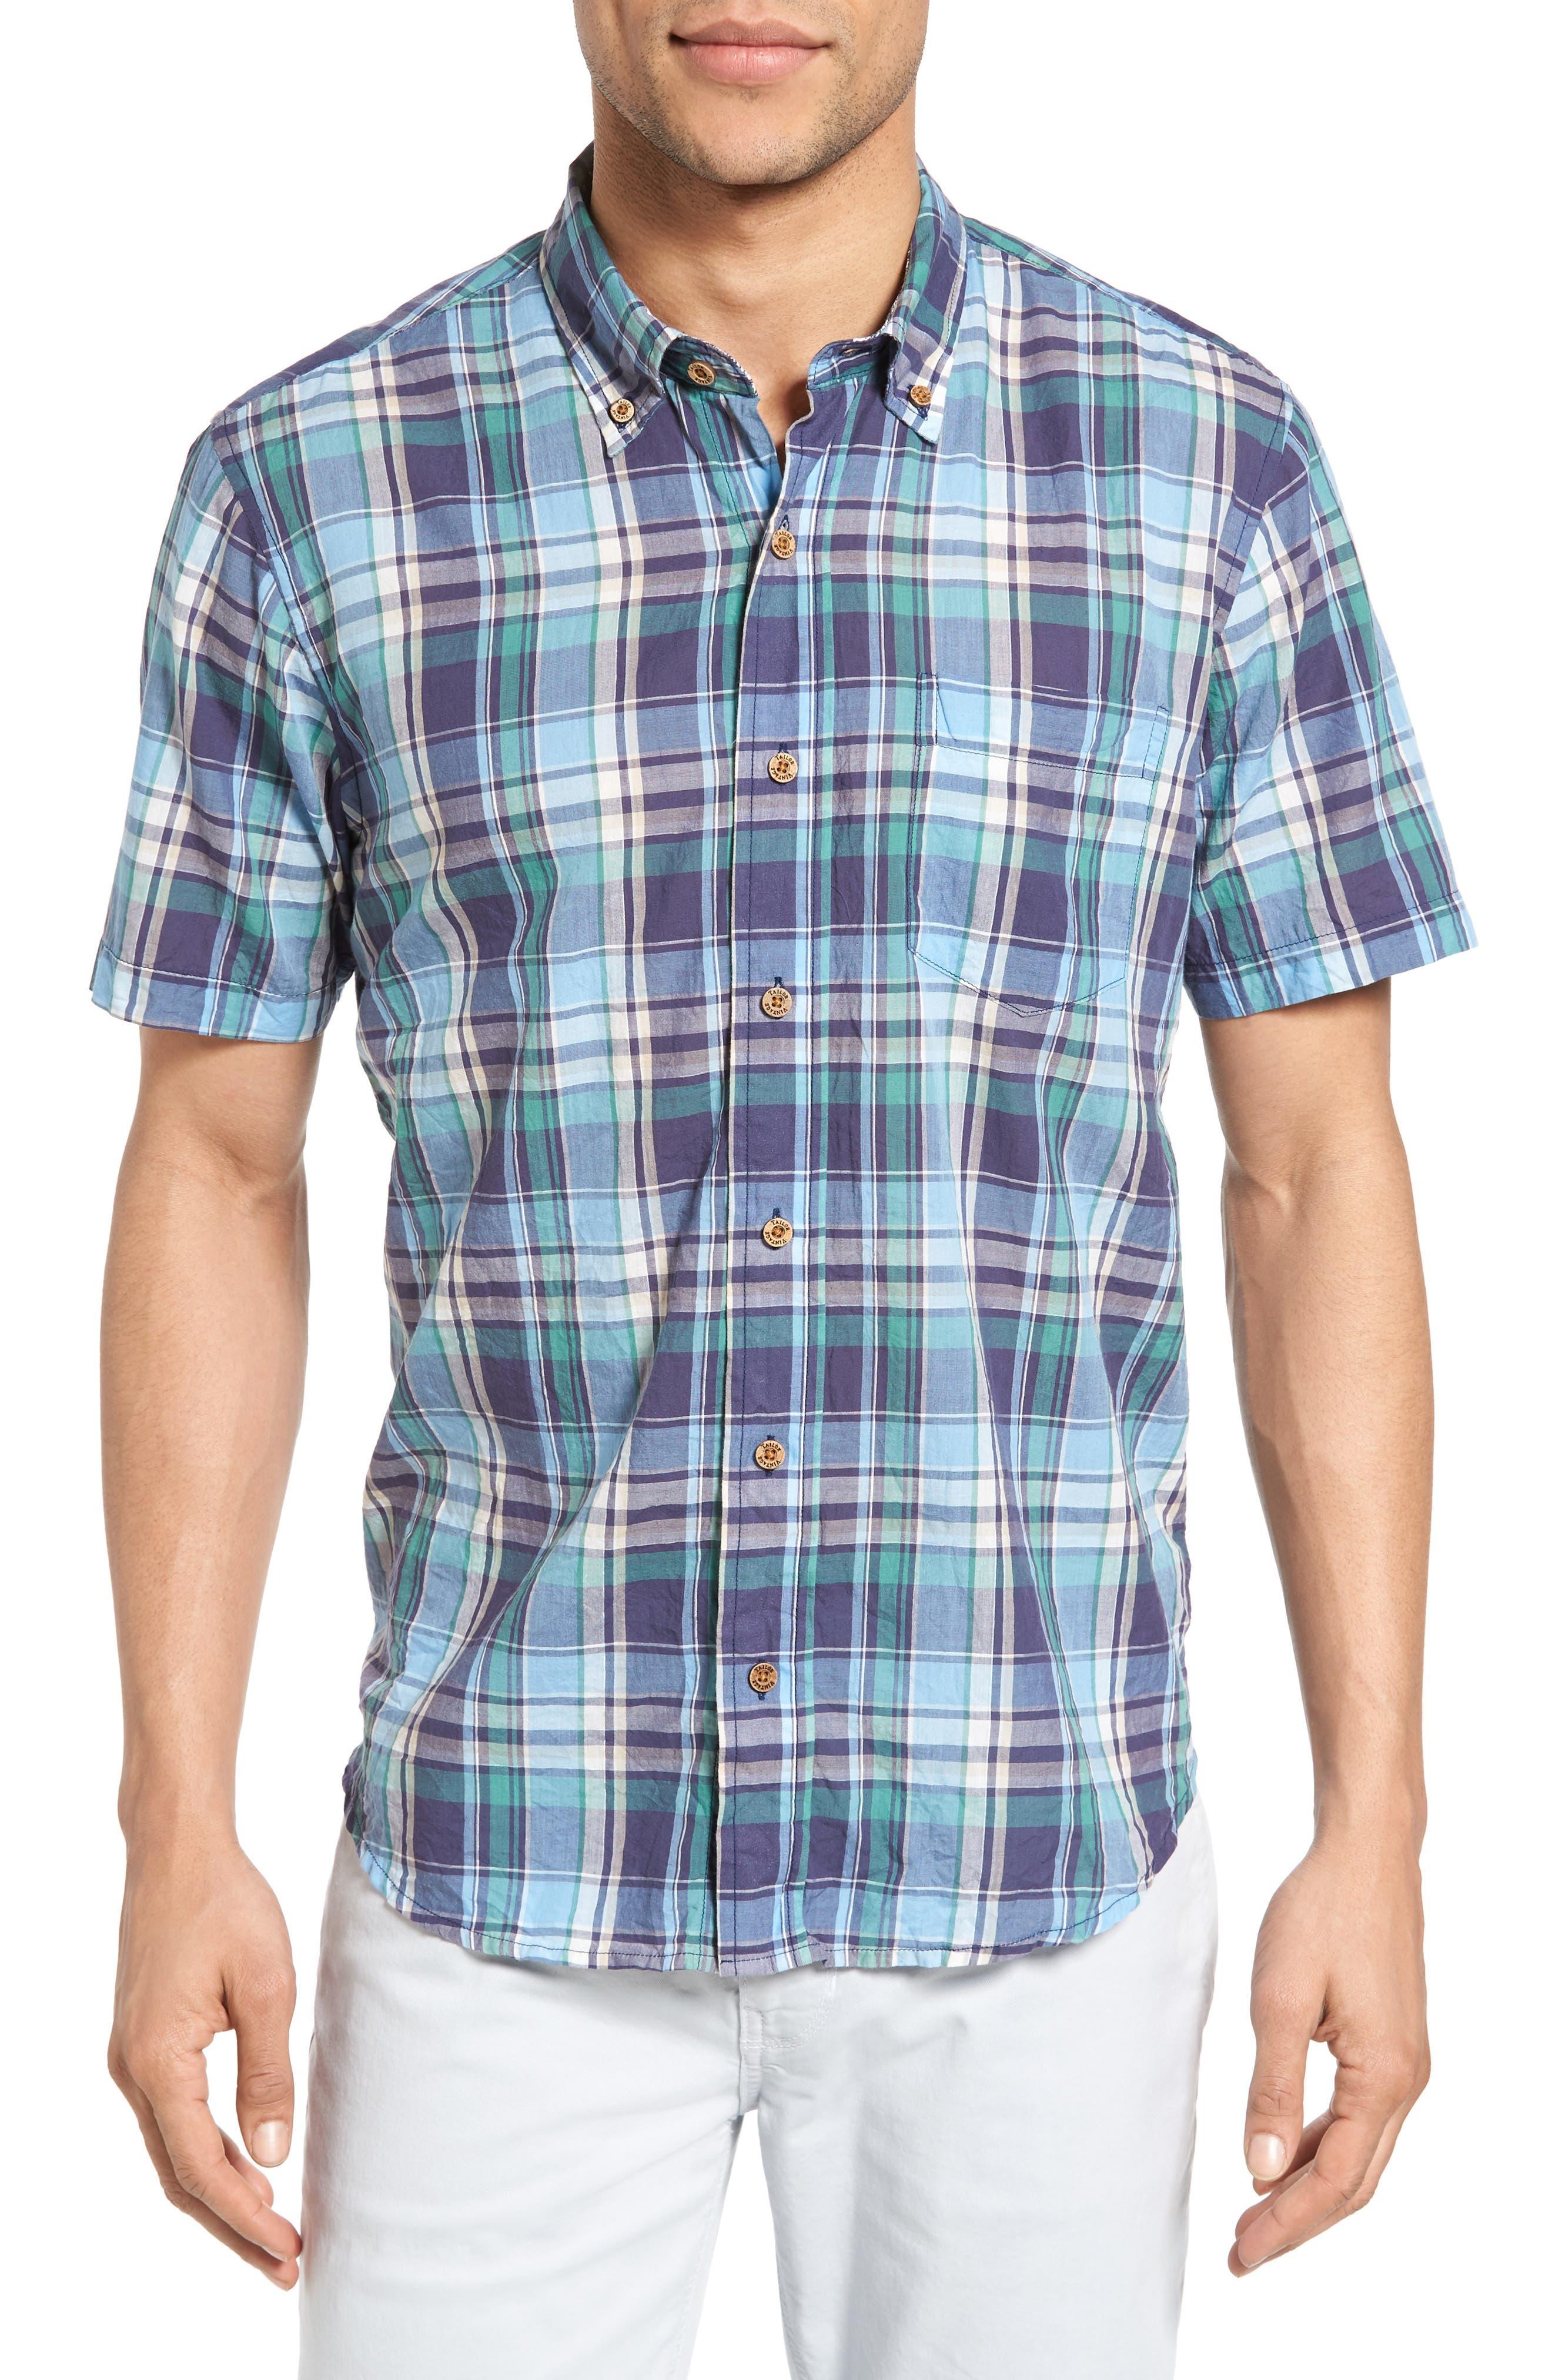 Tailor Vintage Crinkle Plaid Sport Shirt